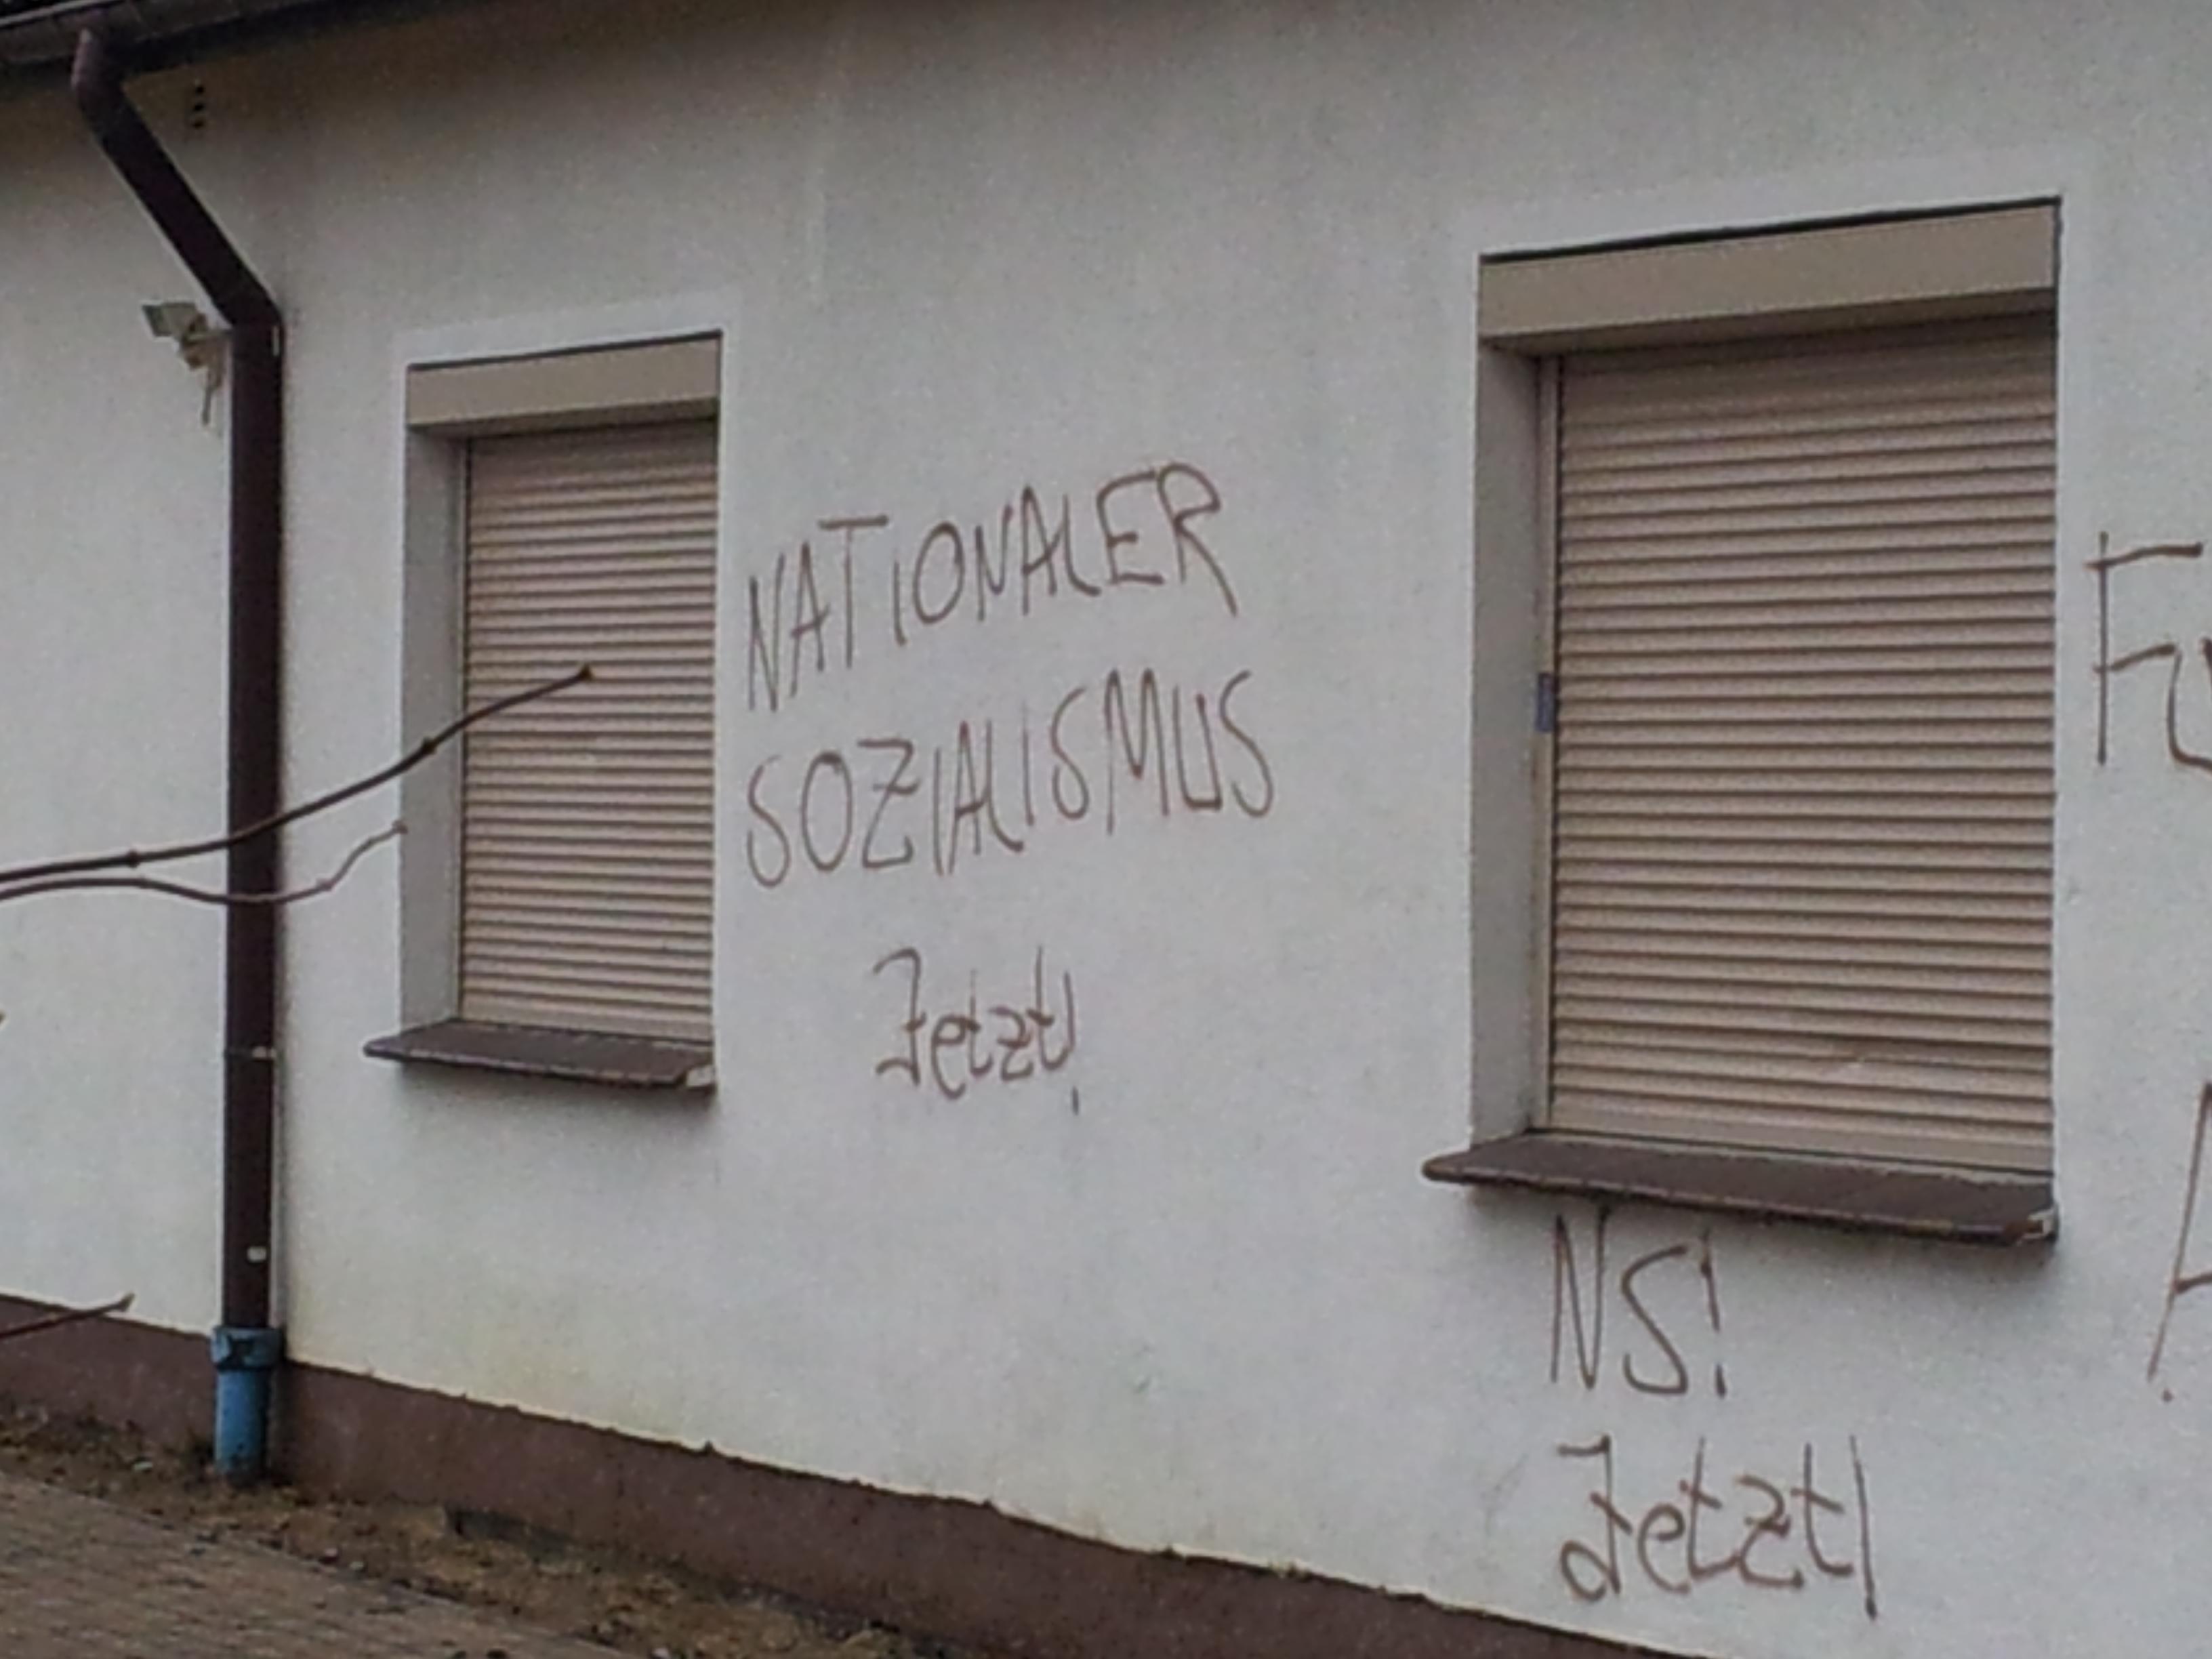 "\""nationaler Sozialismus jetzt\"""